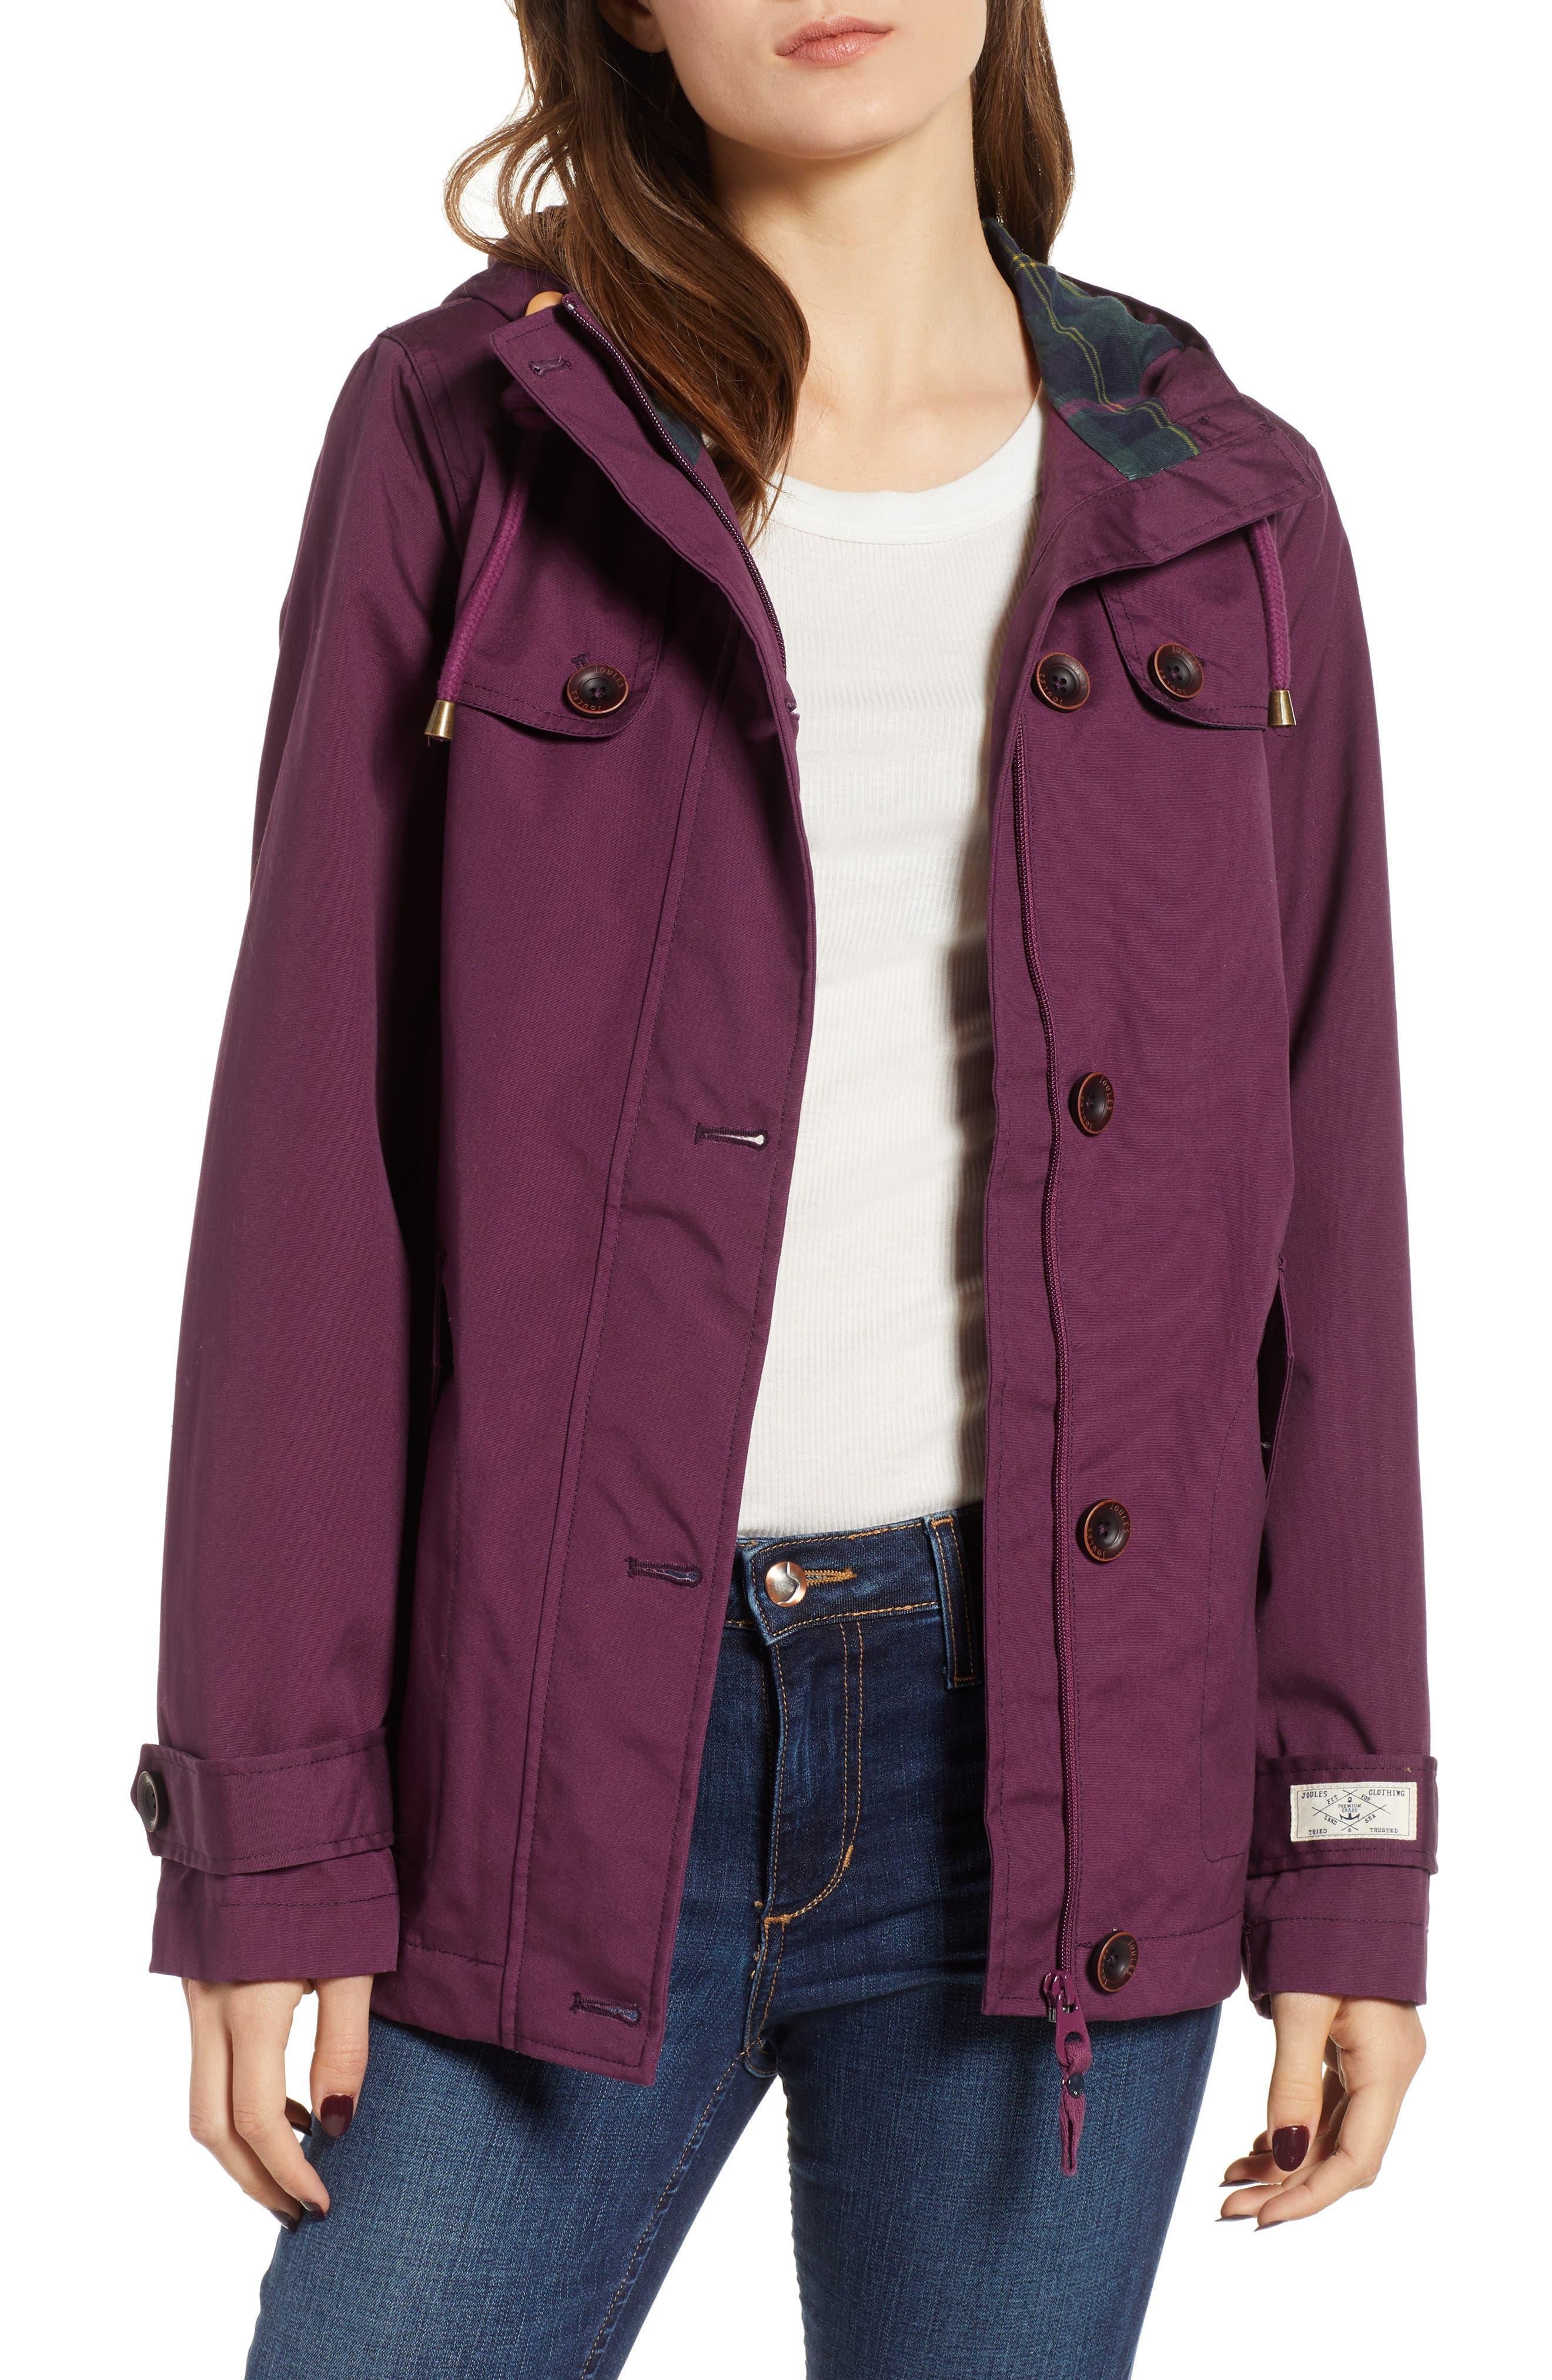 JOULES,                             Right as Rain Waterproof Hooded Jacket,                             Main thumbnail 1, color,                             930